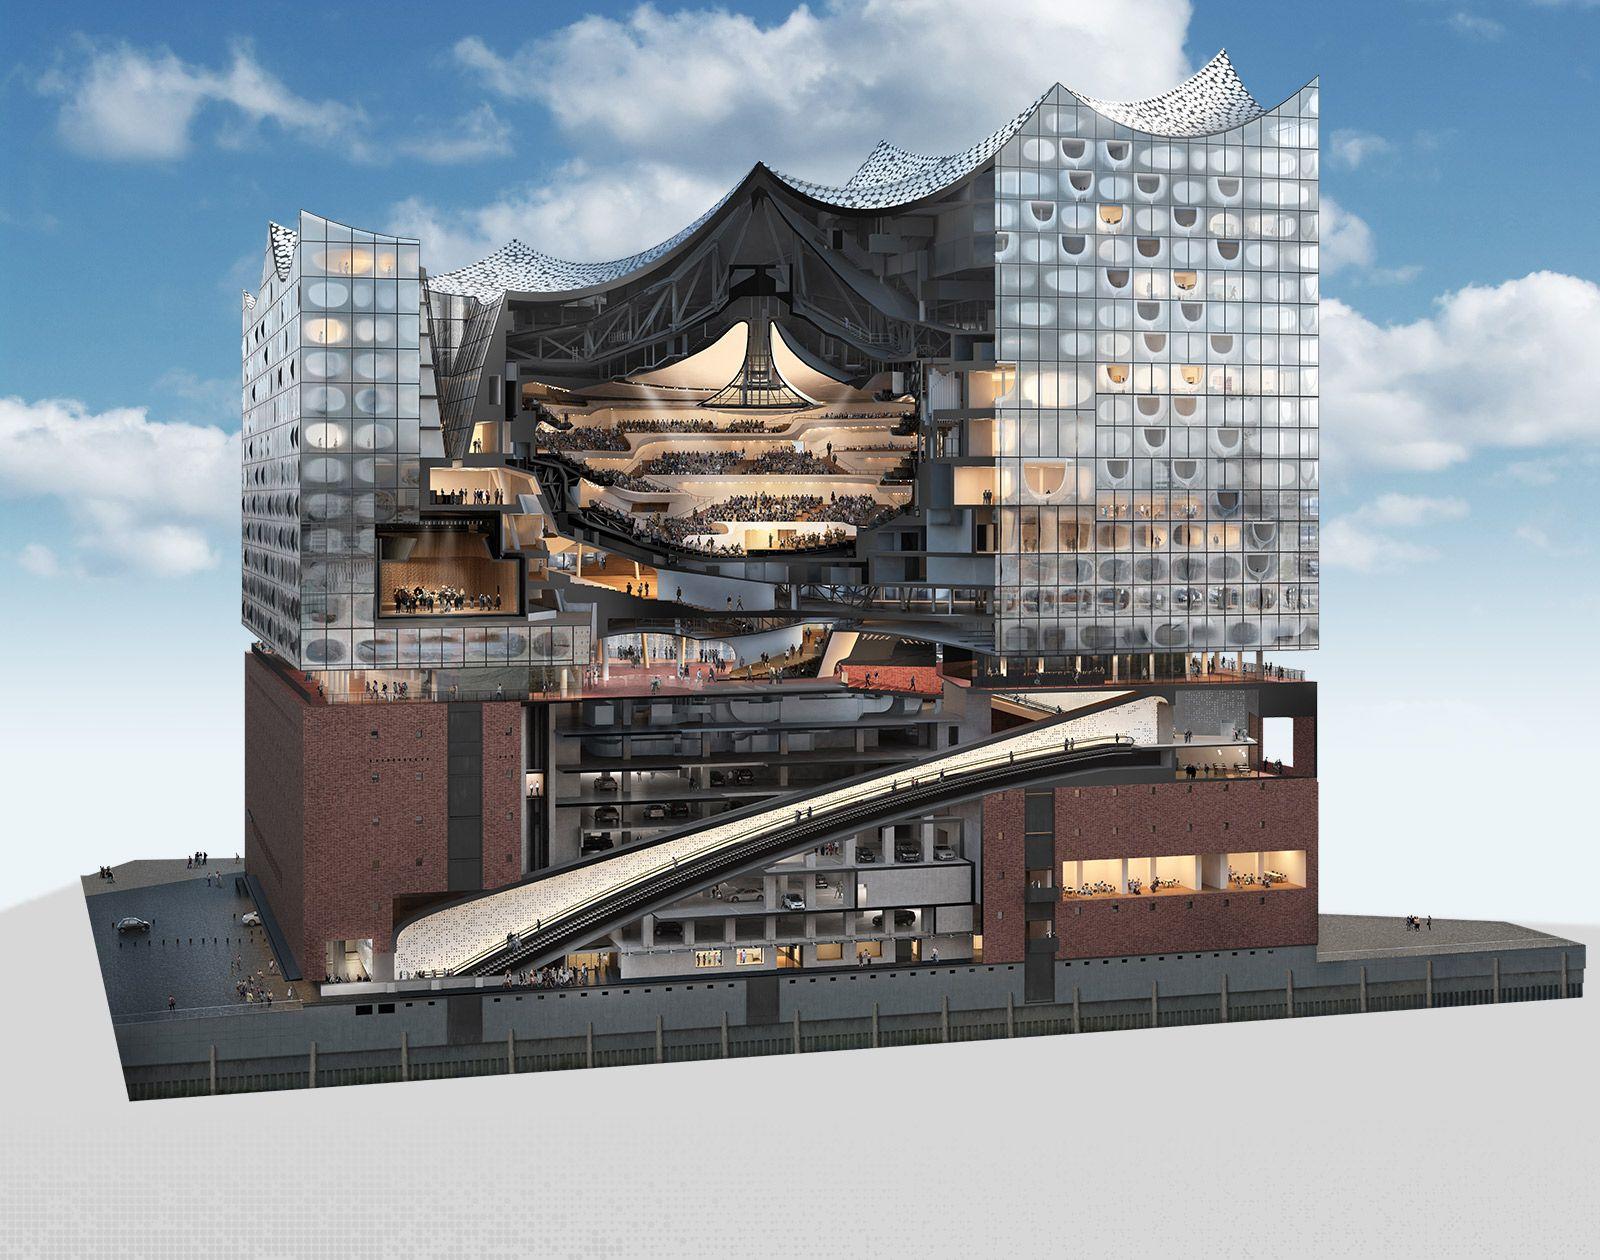 Elbphilharmonie Hamburg Architecture Concert Hall Architecture Architecture Design